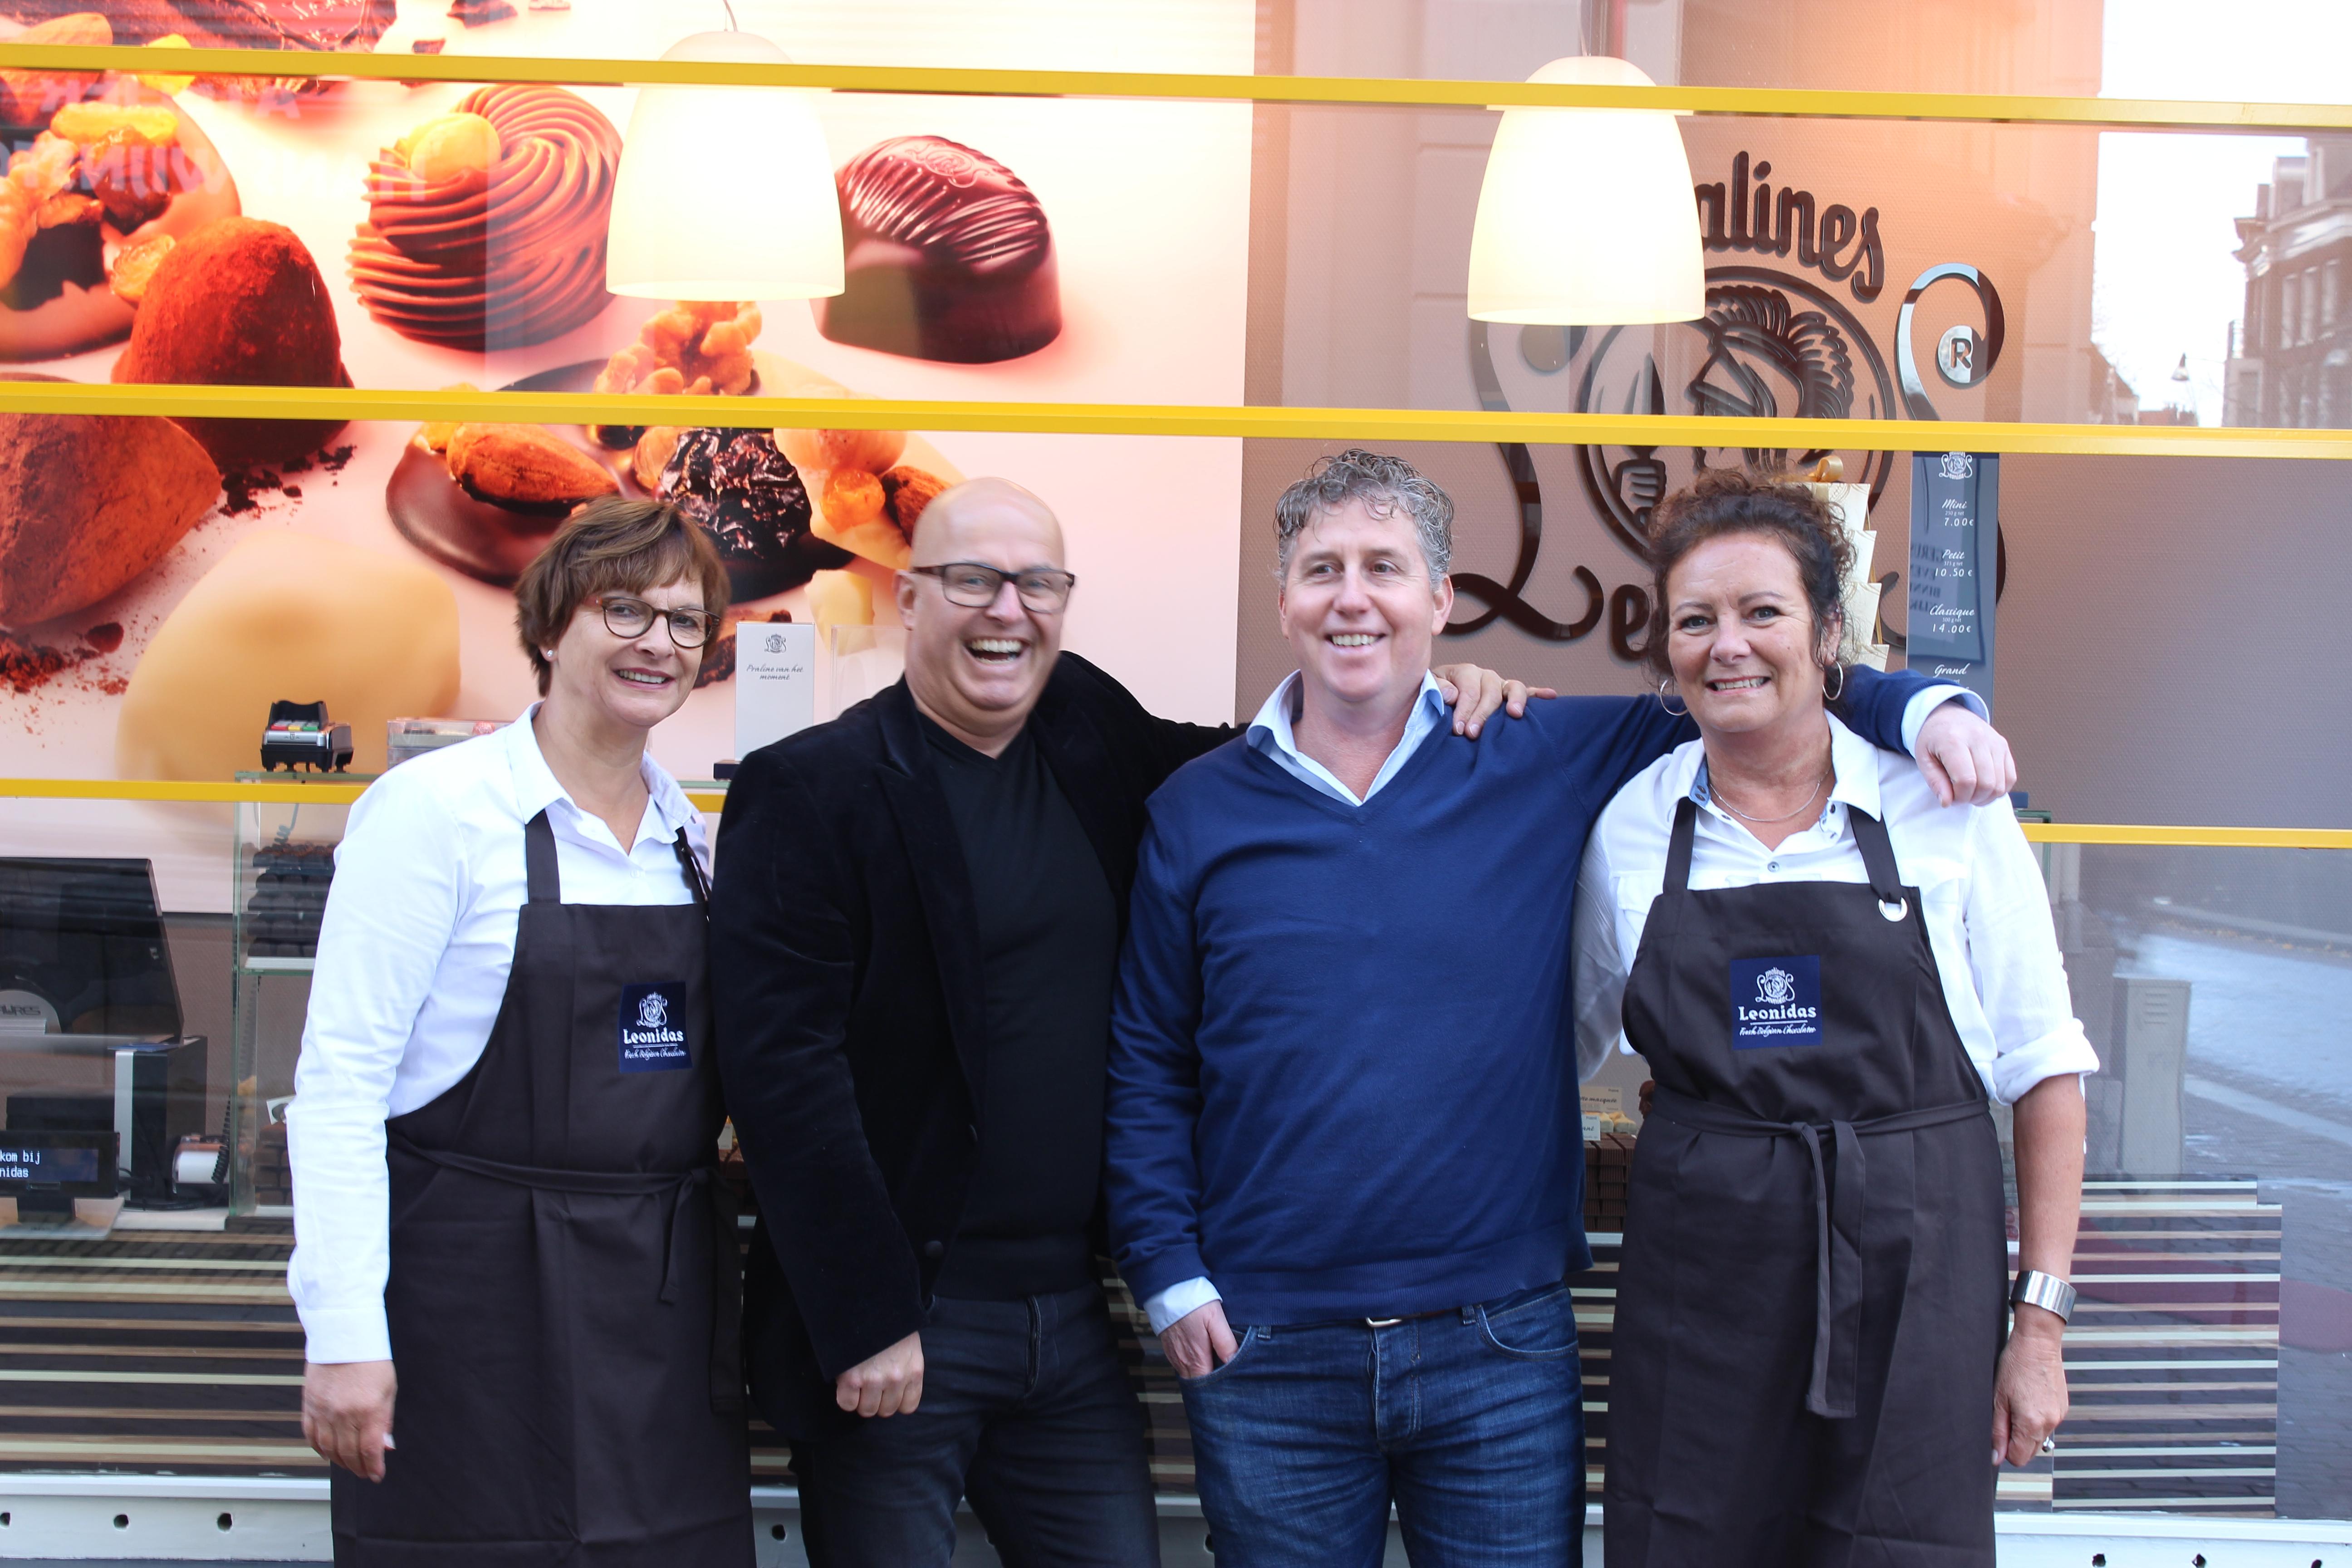 Op de foto v.l.n.r. Aly Kalter (gastvrouw), Ron Castelijns (initiatiefnemer), Jan-Piet Broersma (initiatiefnemer) en Annelies Postmus (gastvrouw). Bron: FranchiseFormules.NL